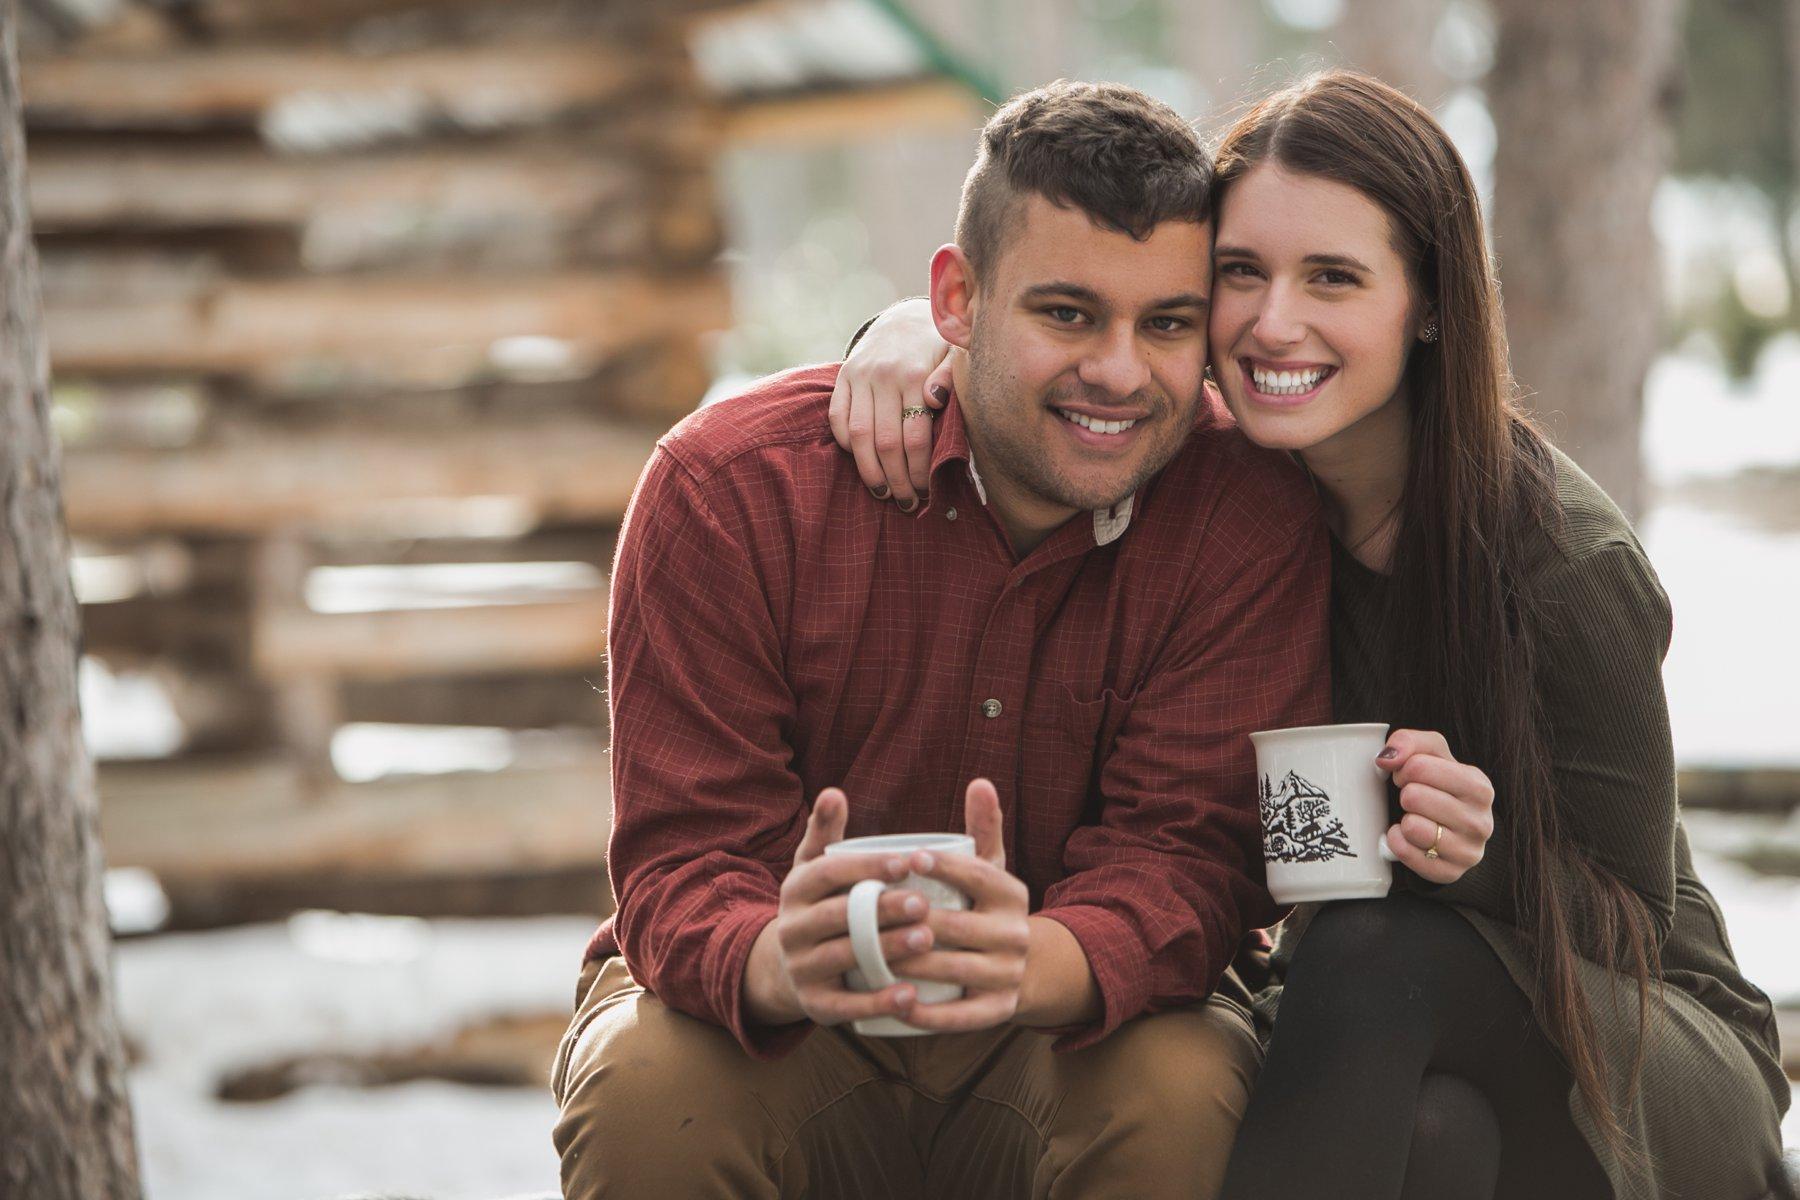 Emma + Kyler -  Cozy Intimate Winter Engagements